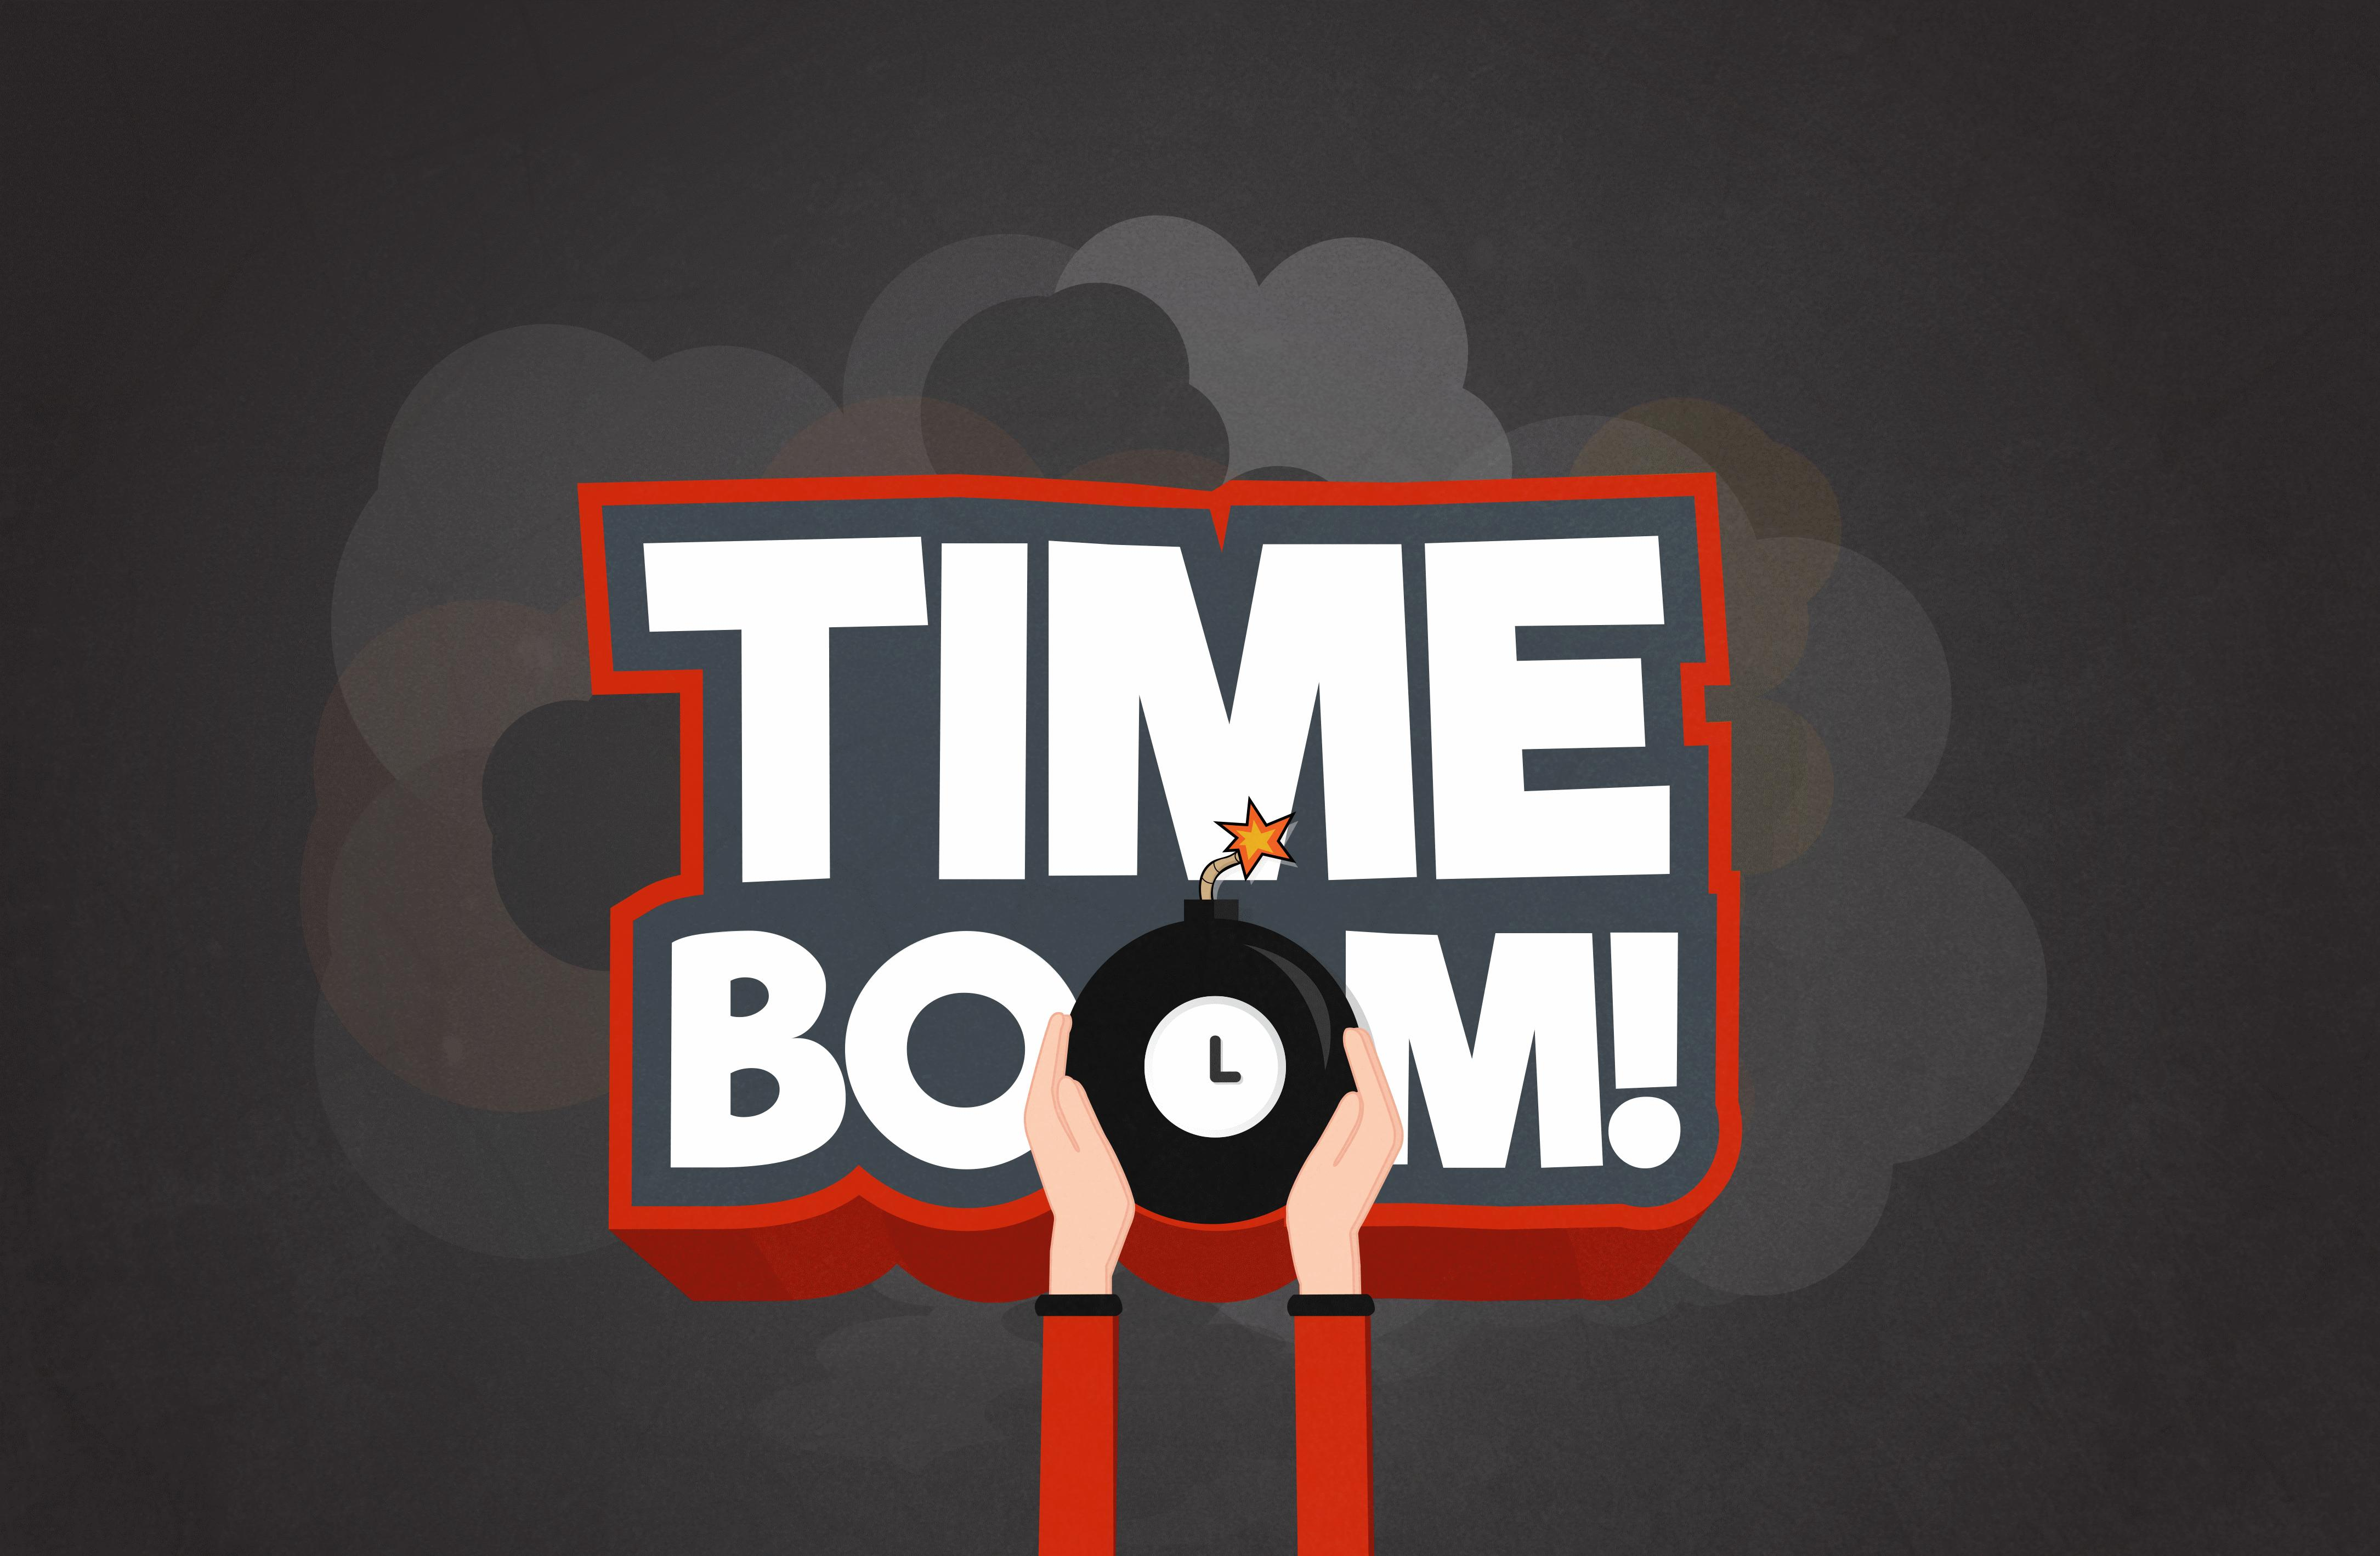 TIMEBOOM